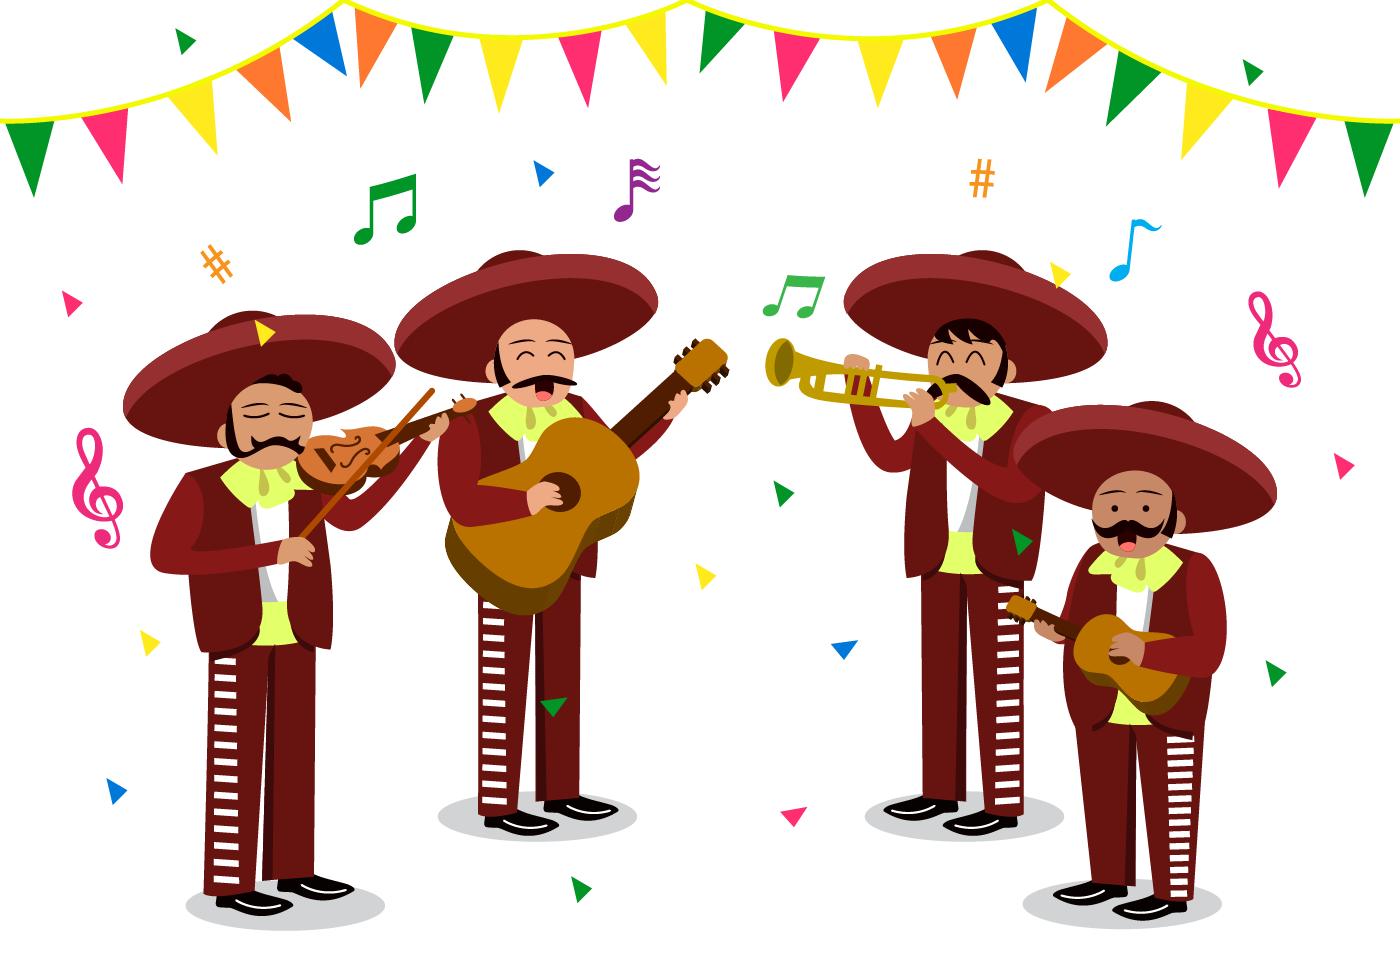 mariachi free vector art 8621 free downloads rh vecteezy com mariachi cartel de medellin clipart mariachi band